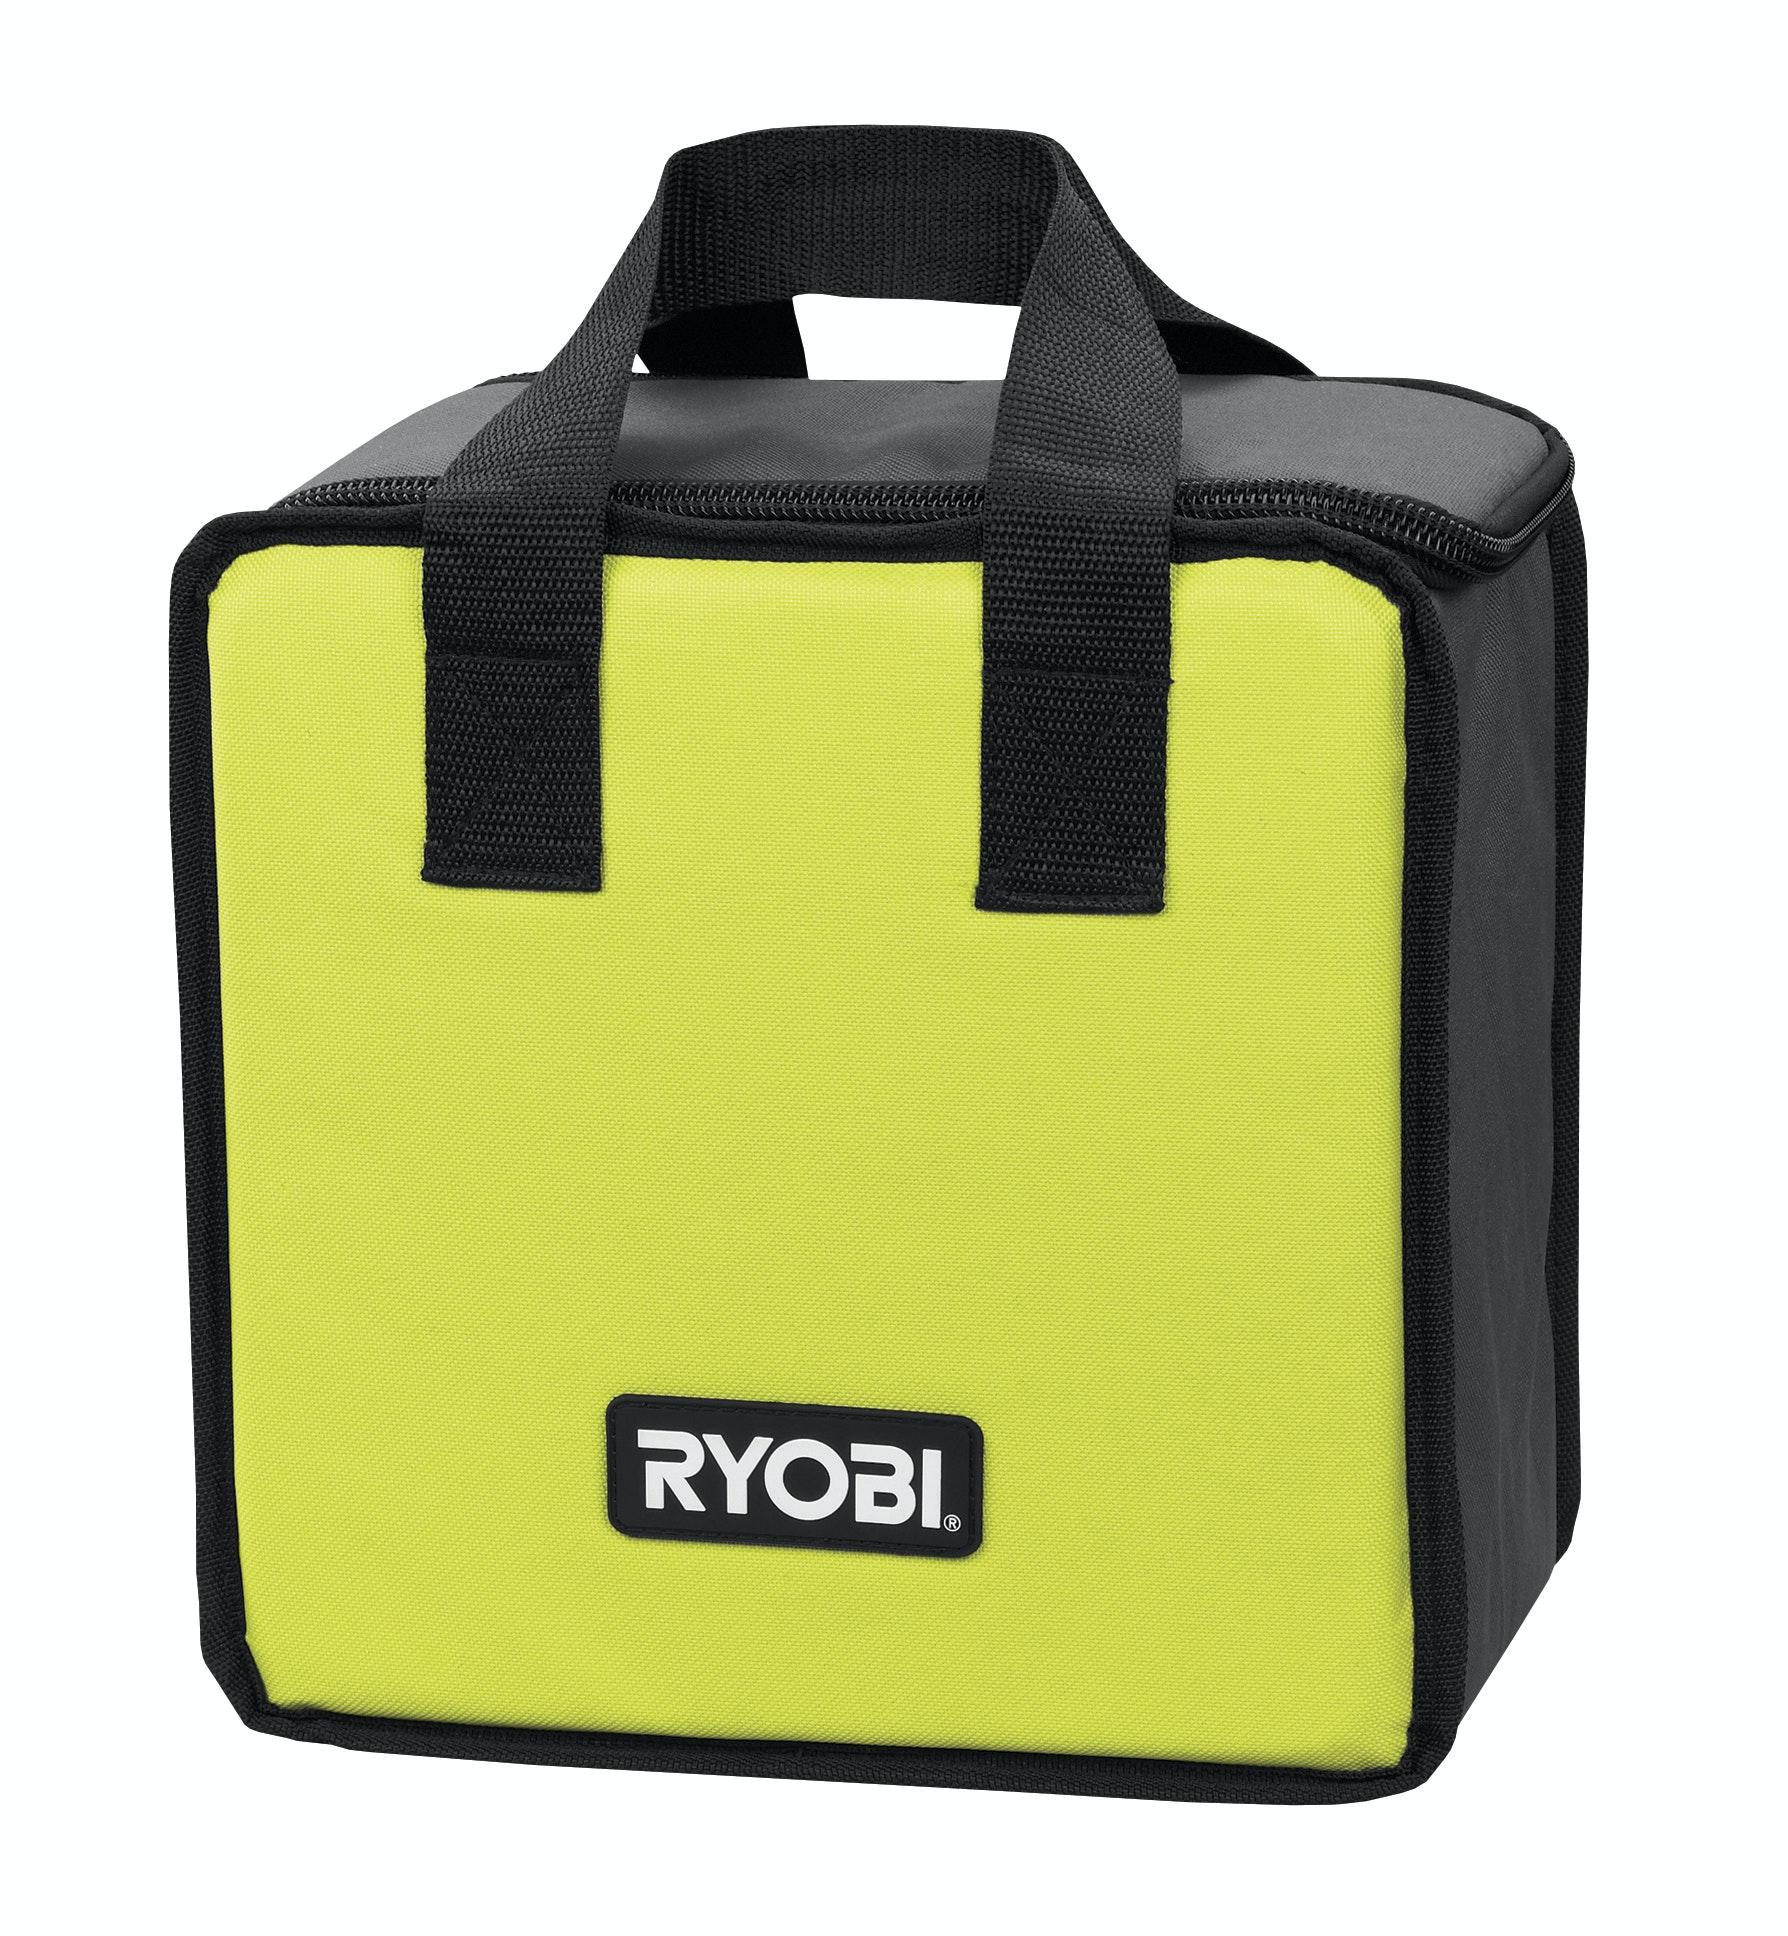 Verktygskit Ryobi One+ R18Ddid-220S 18V